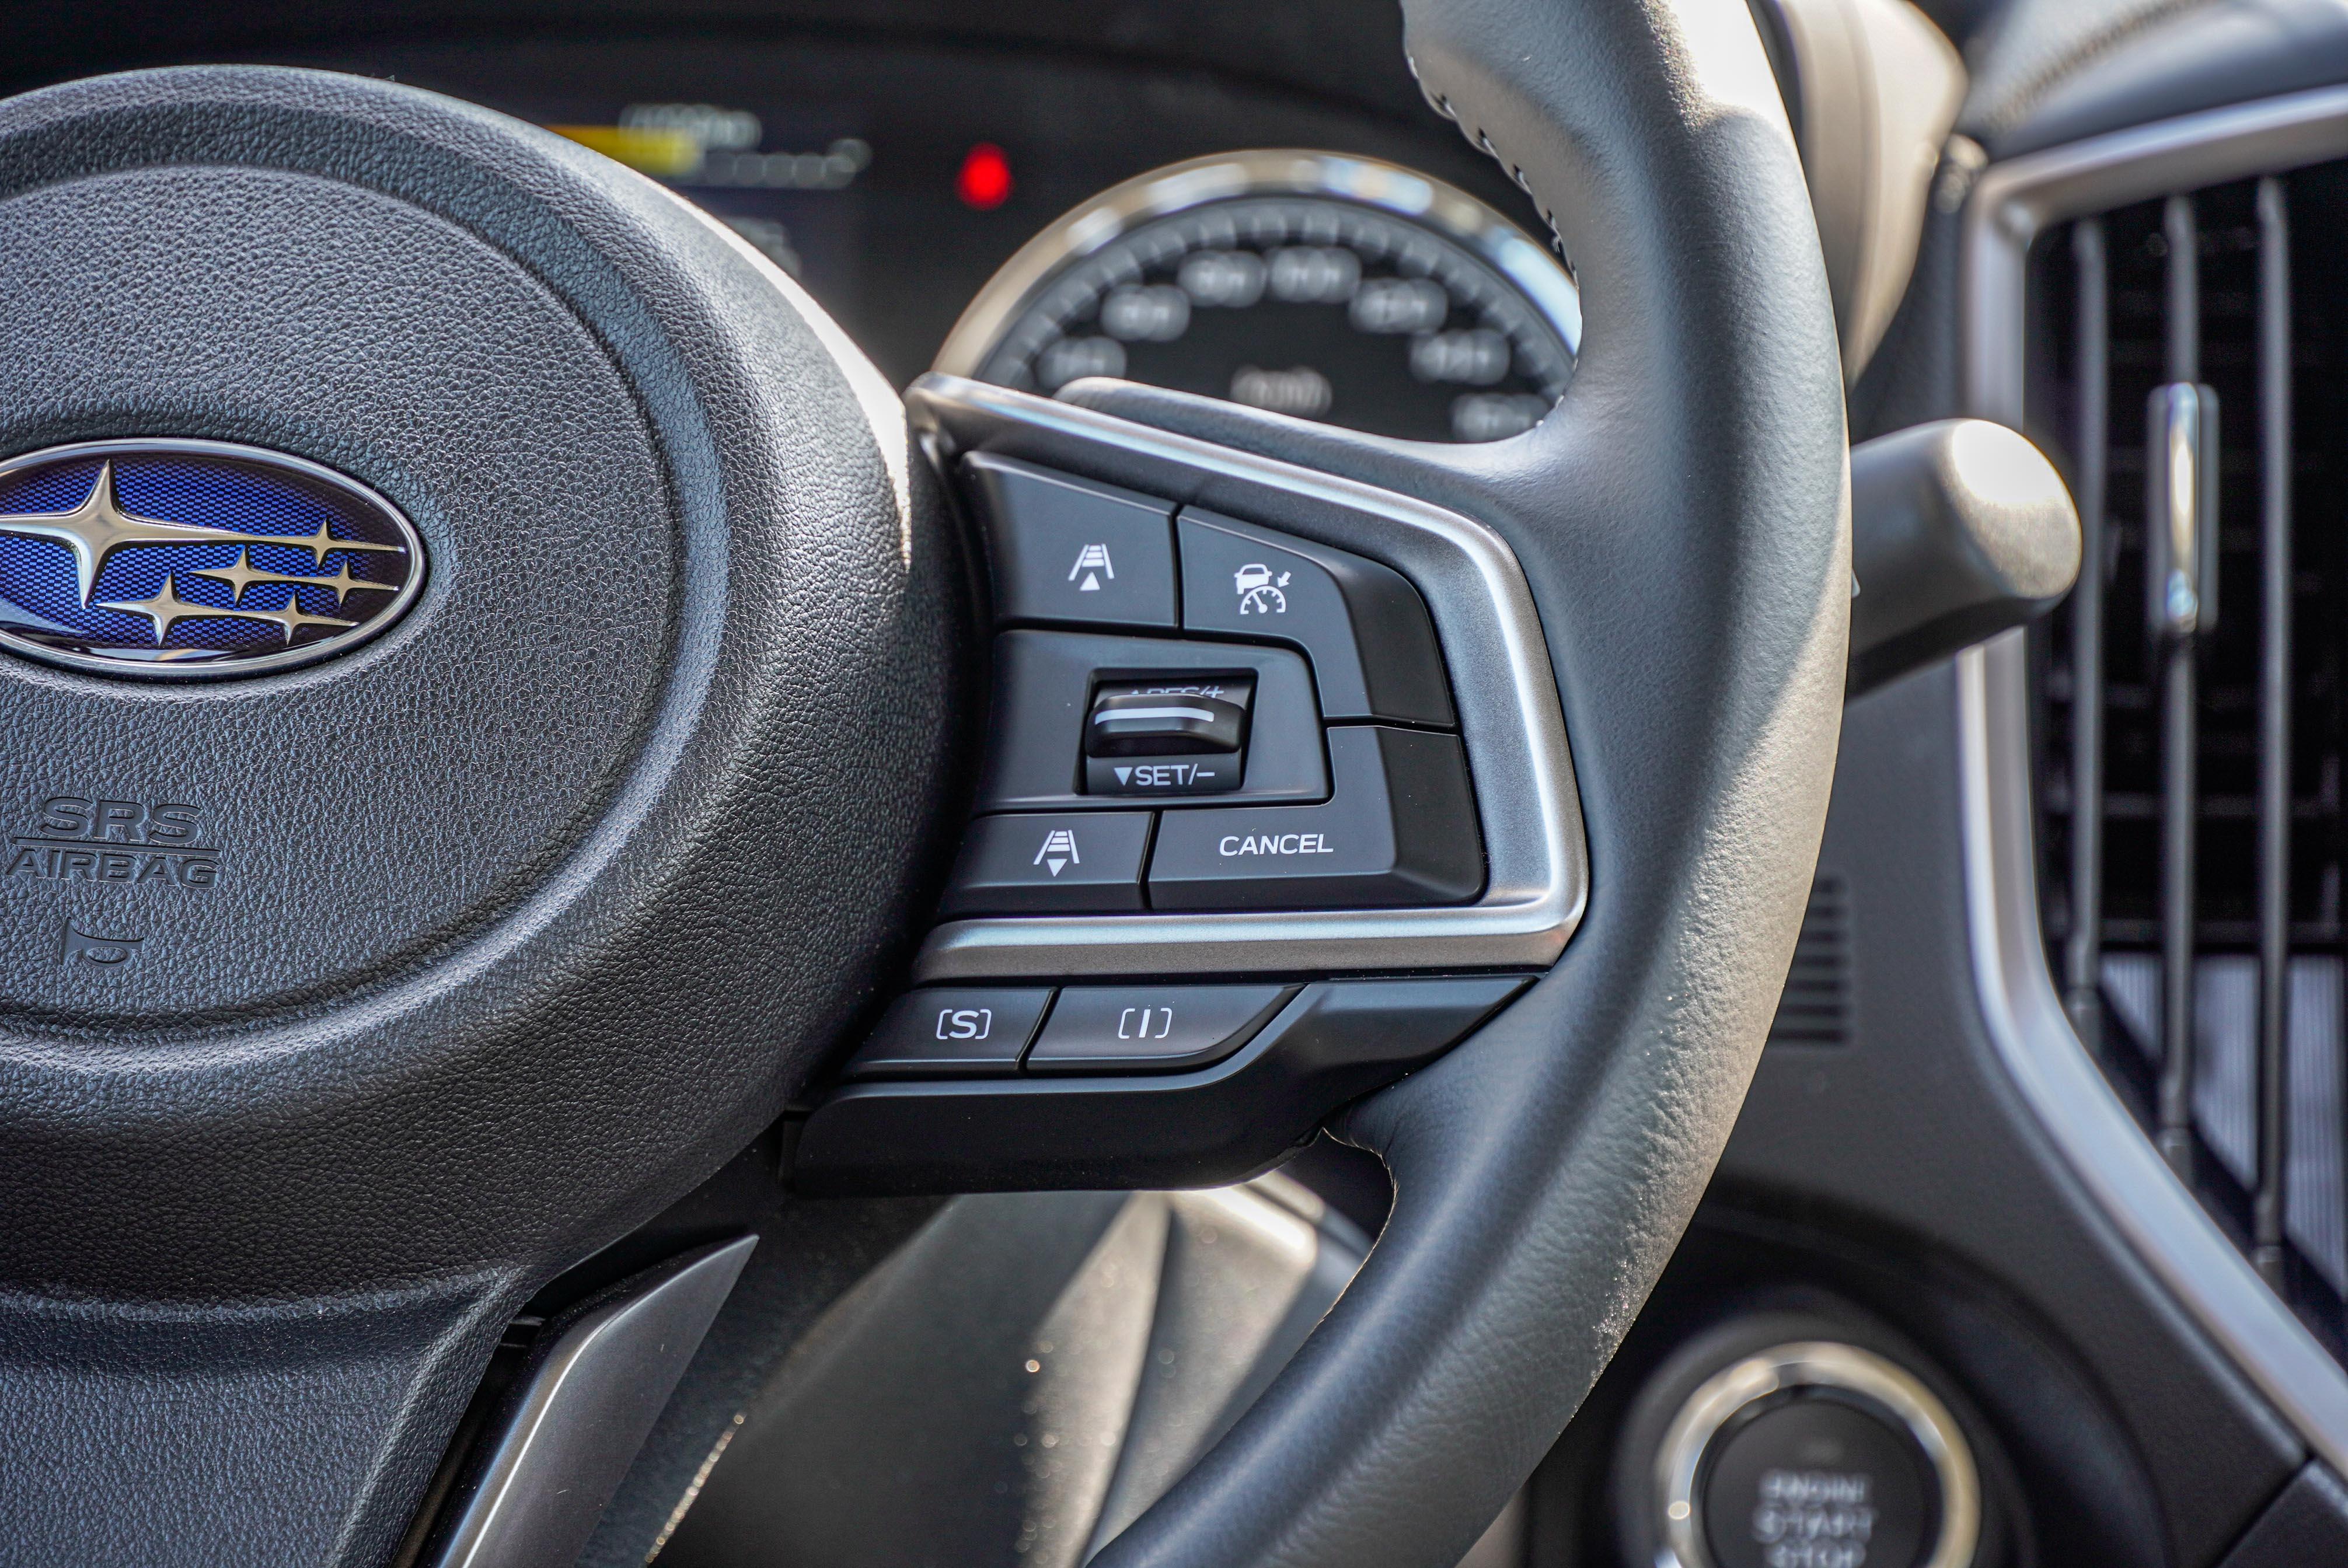 Eyesight 的跟車系統從方向盤右方控制。